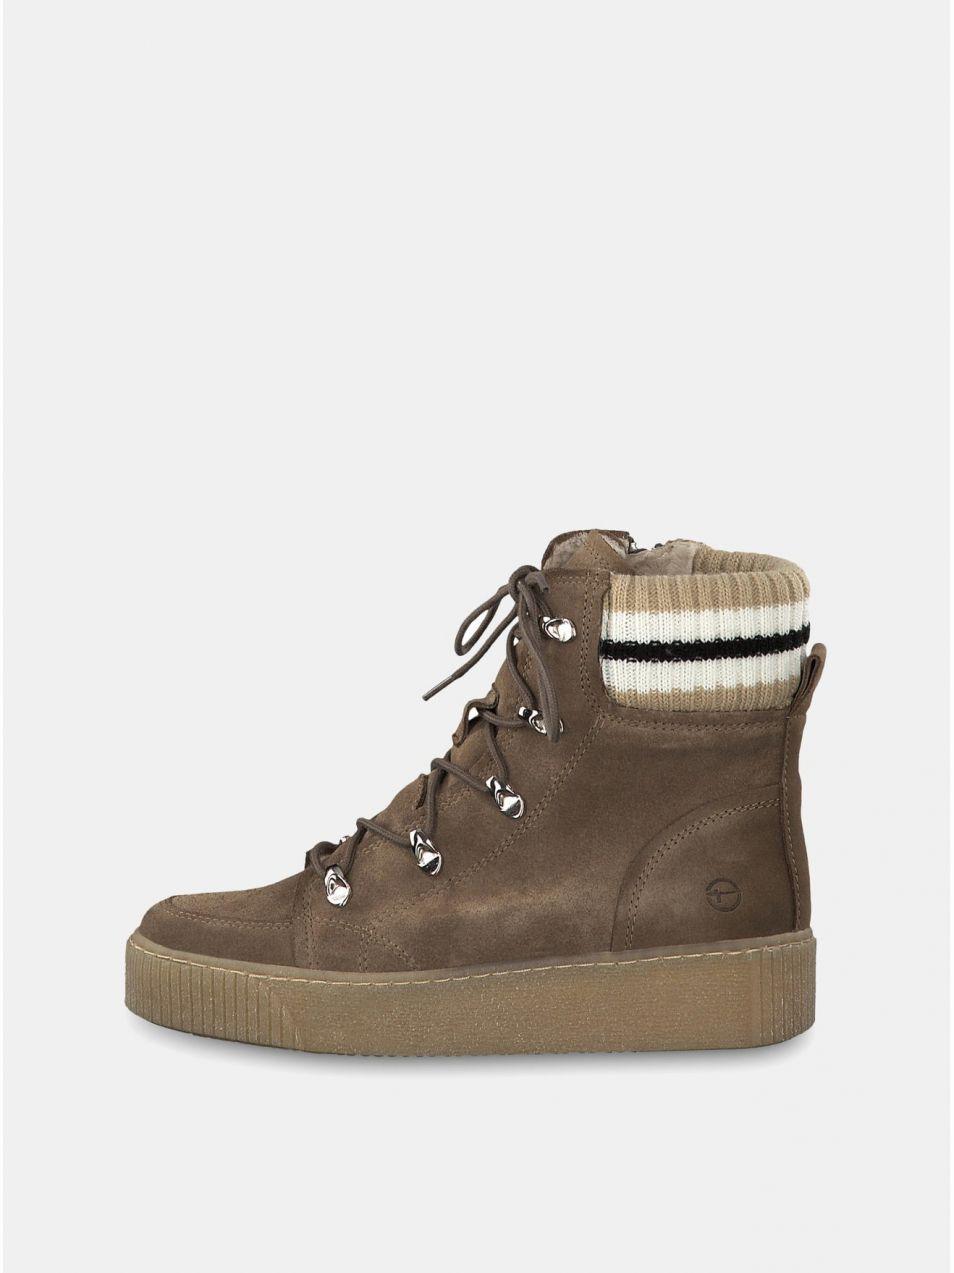 4a6760e556b Béžové semišové členkové zimné topánky na platforme Tamaris značky ...